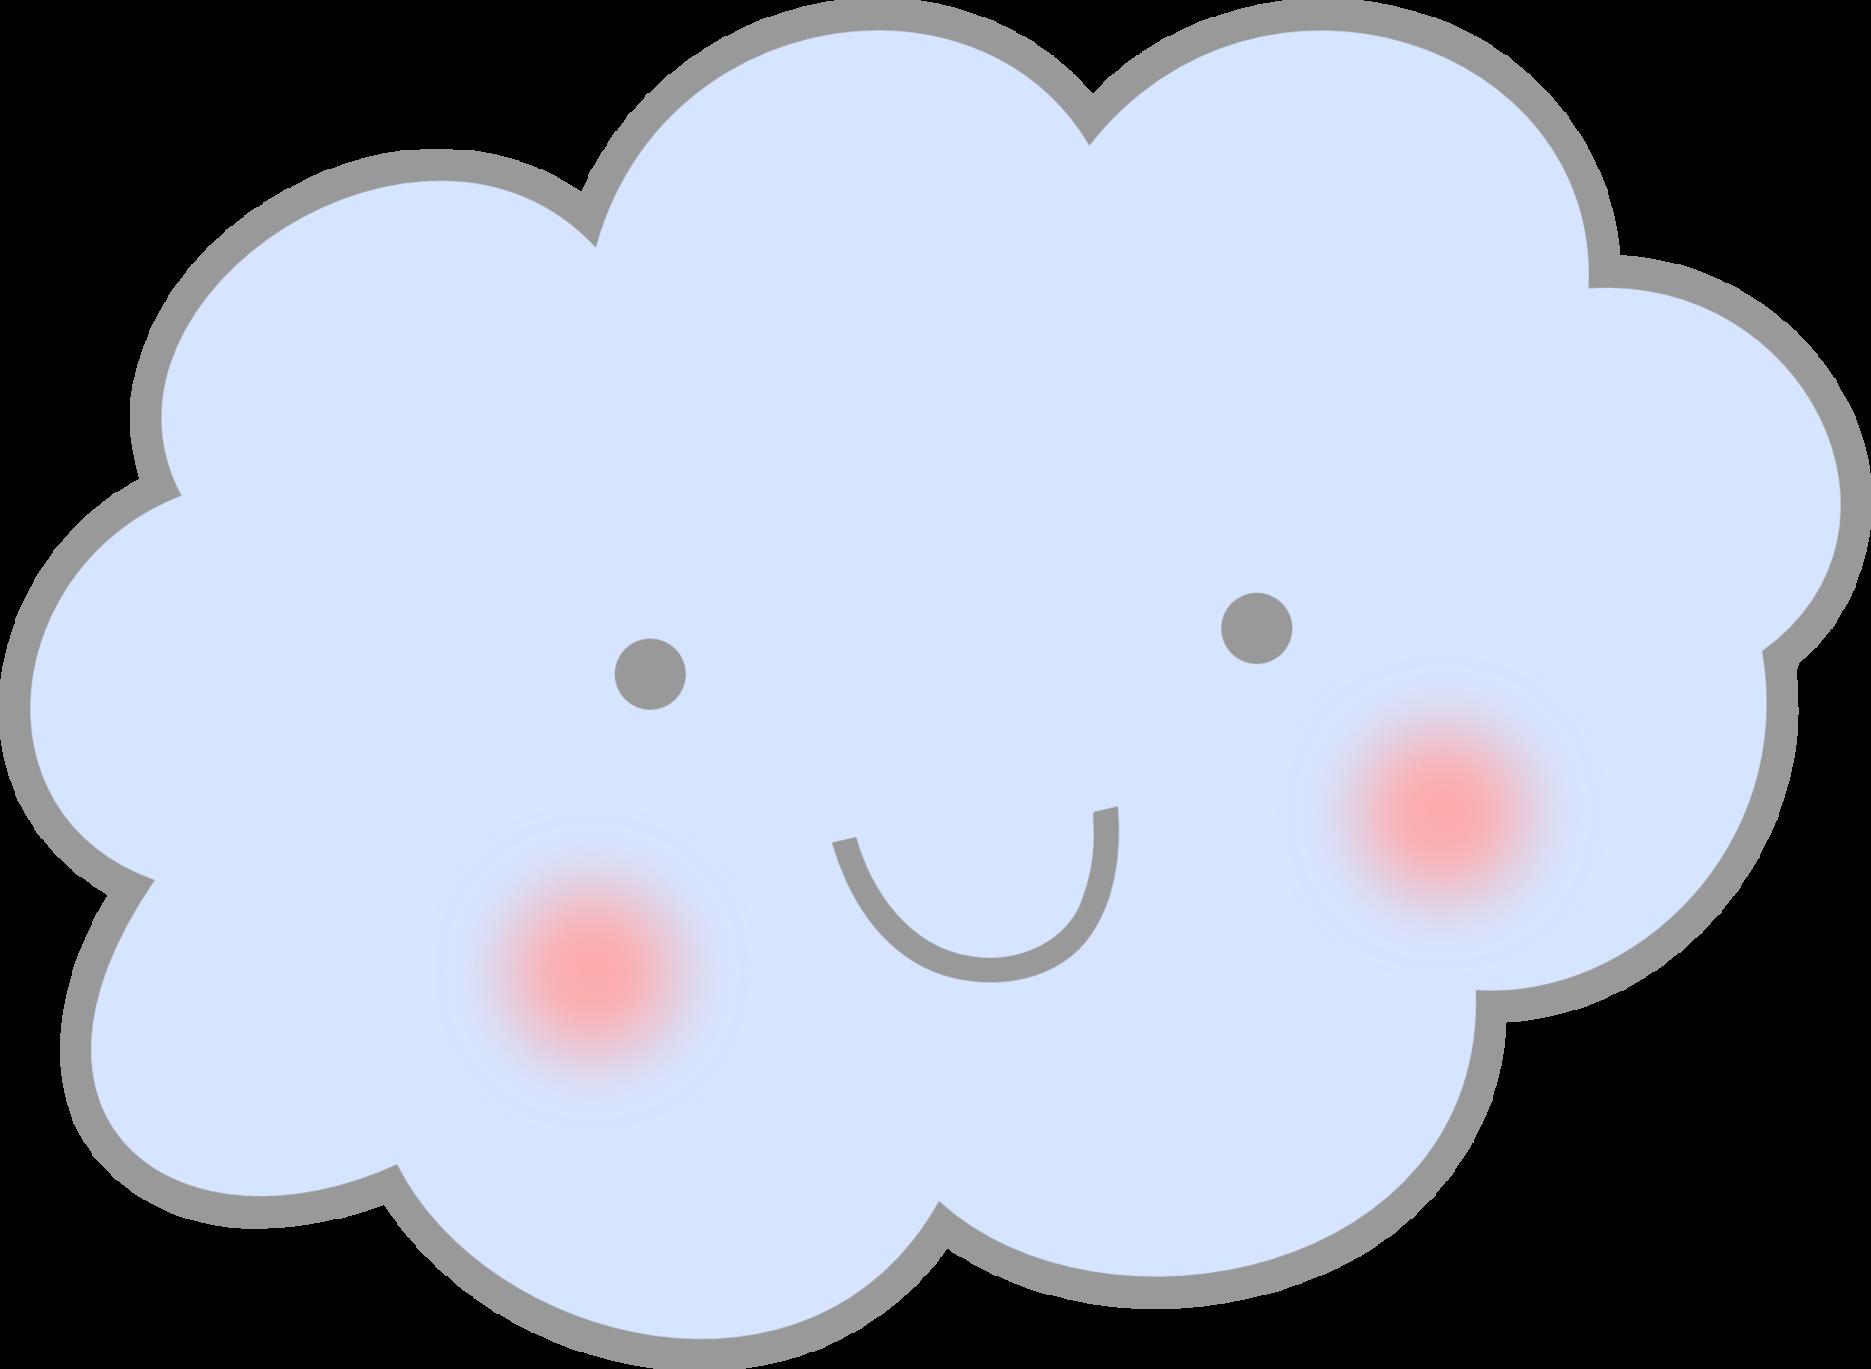 Cloud animated